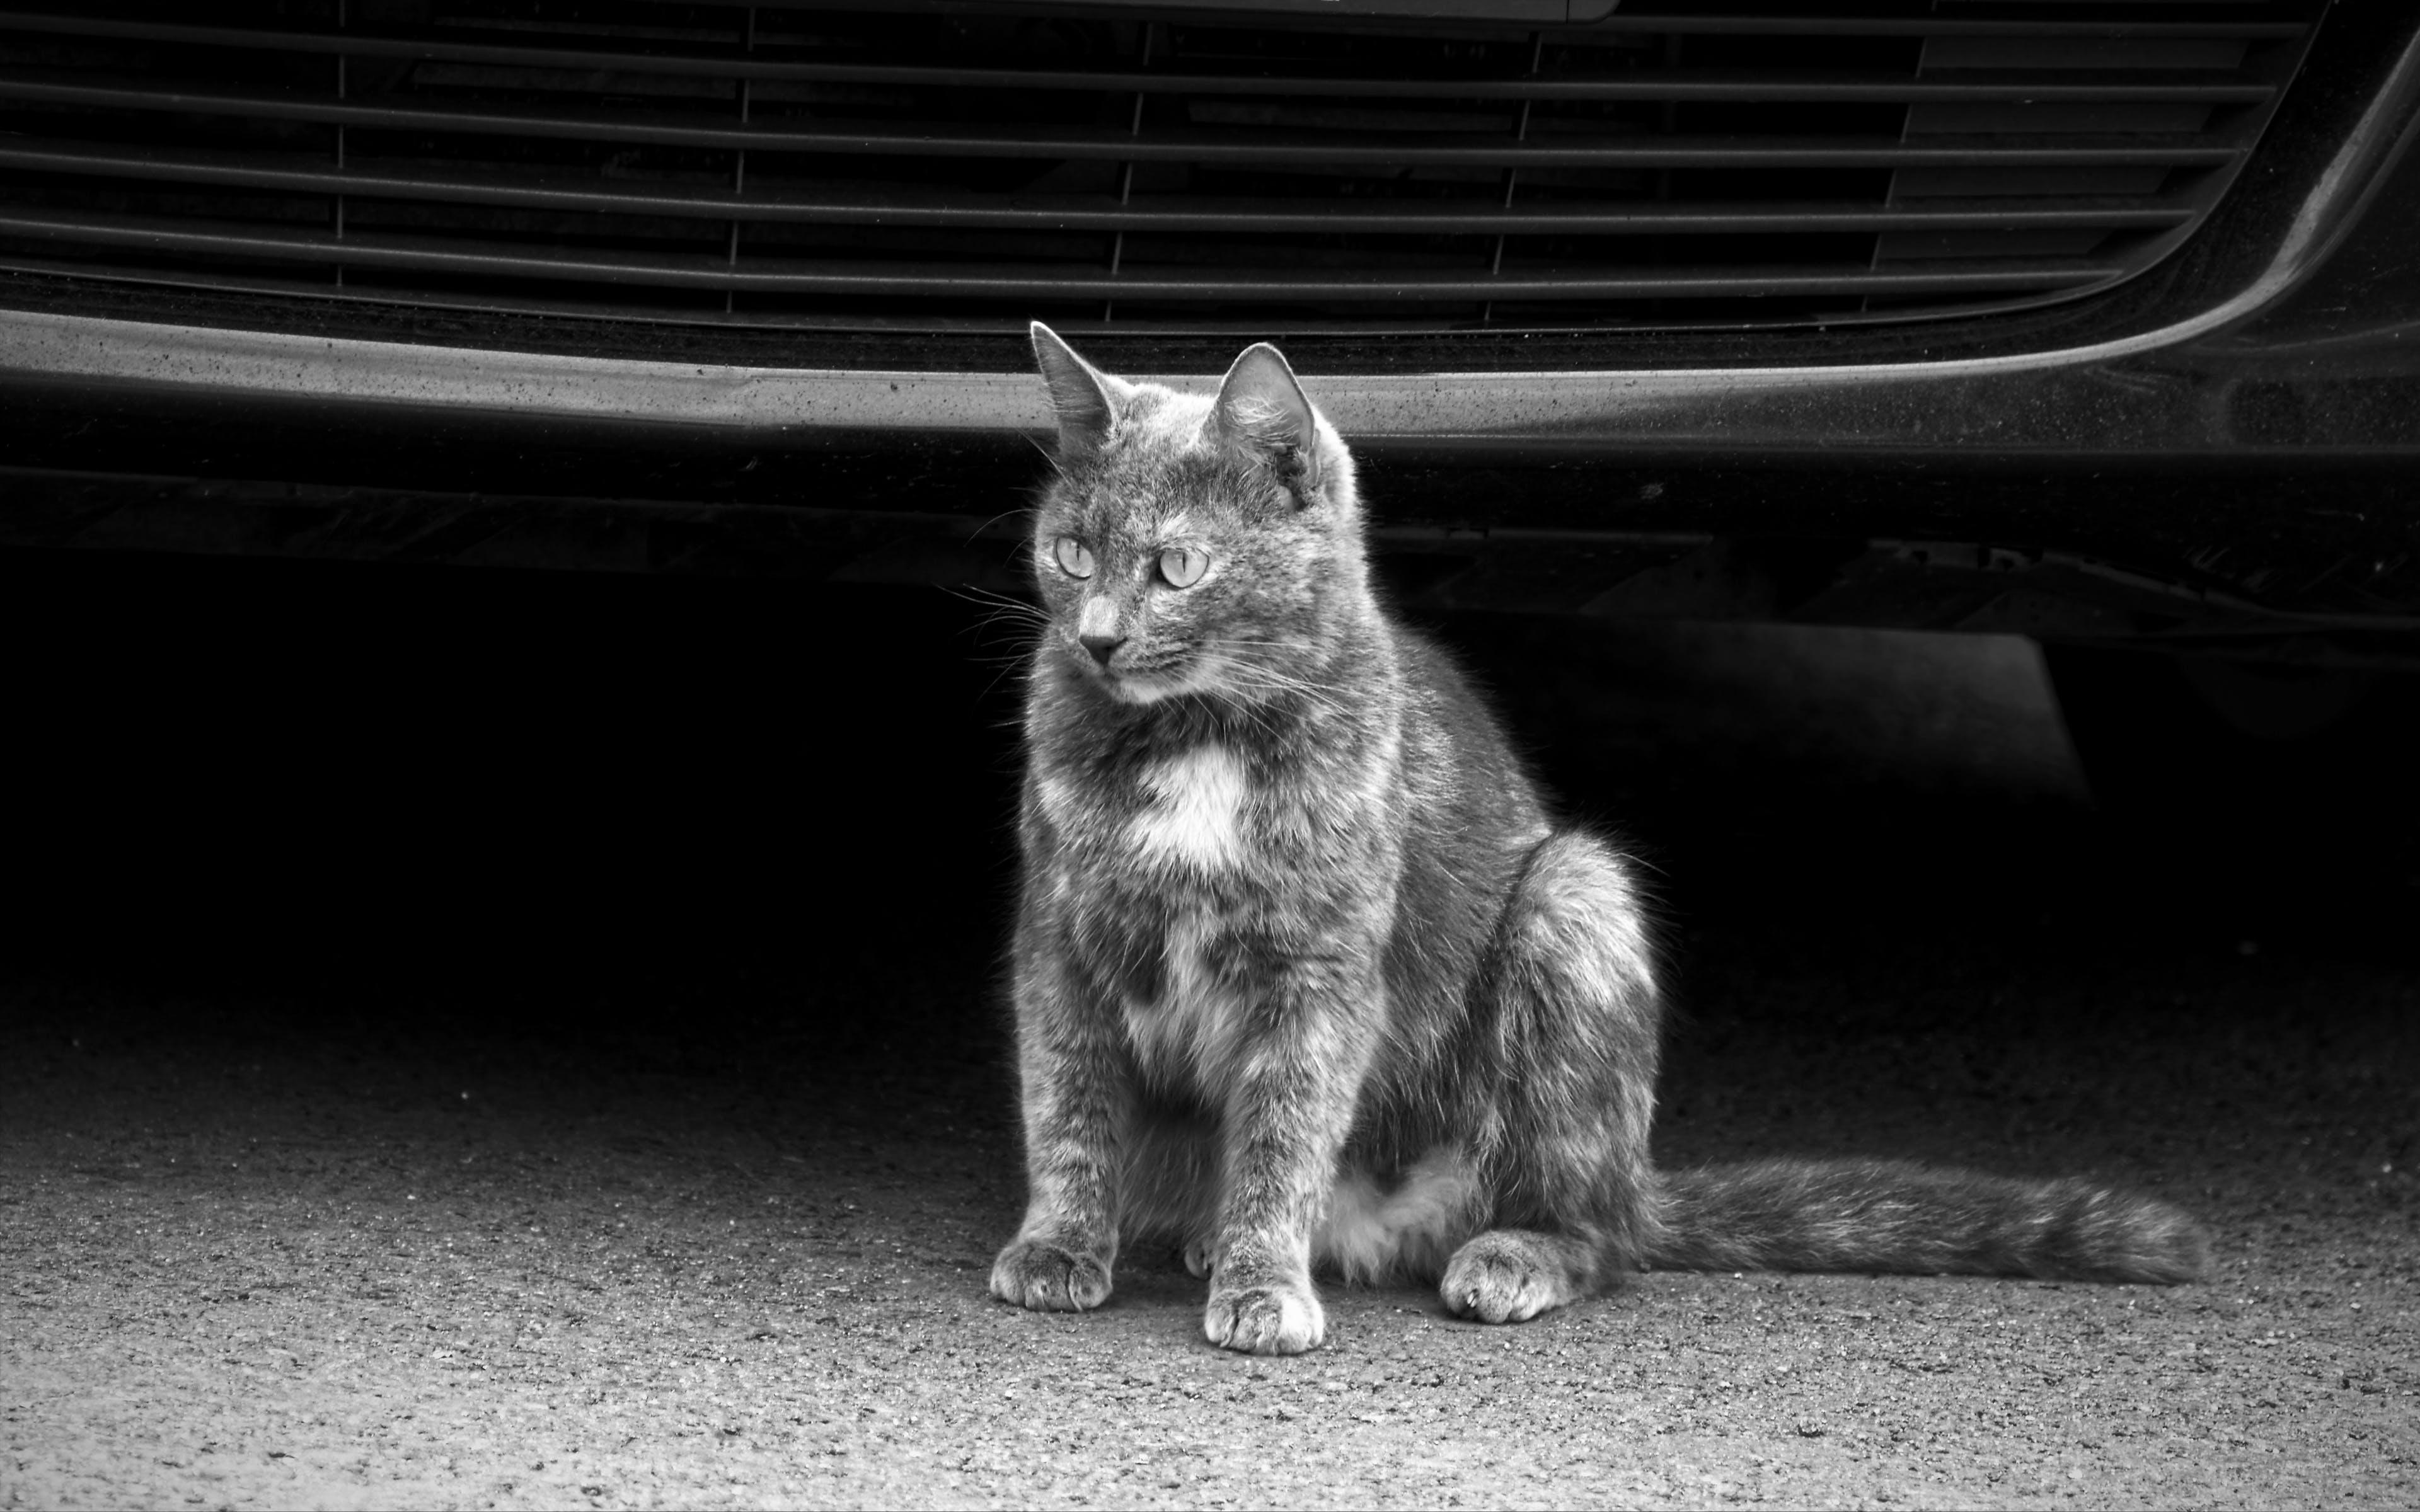 Free stock photo of asphalt, cat near a parked car, feline, pet